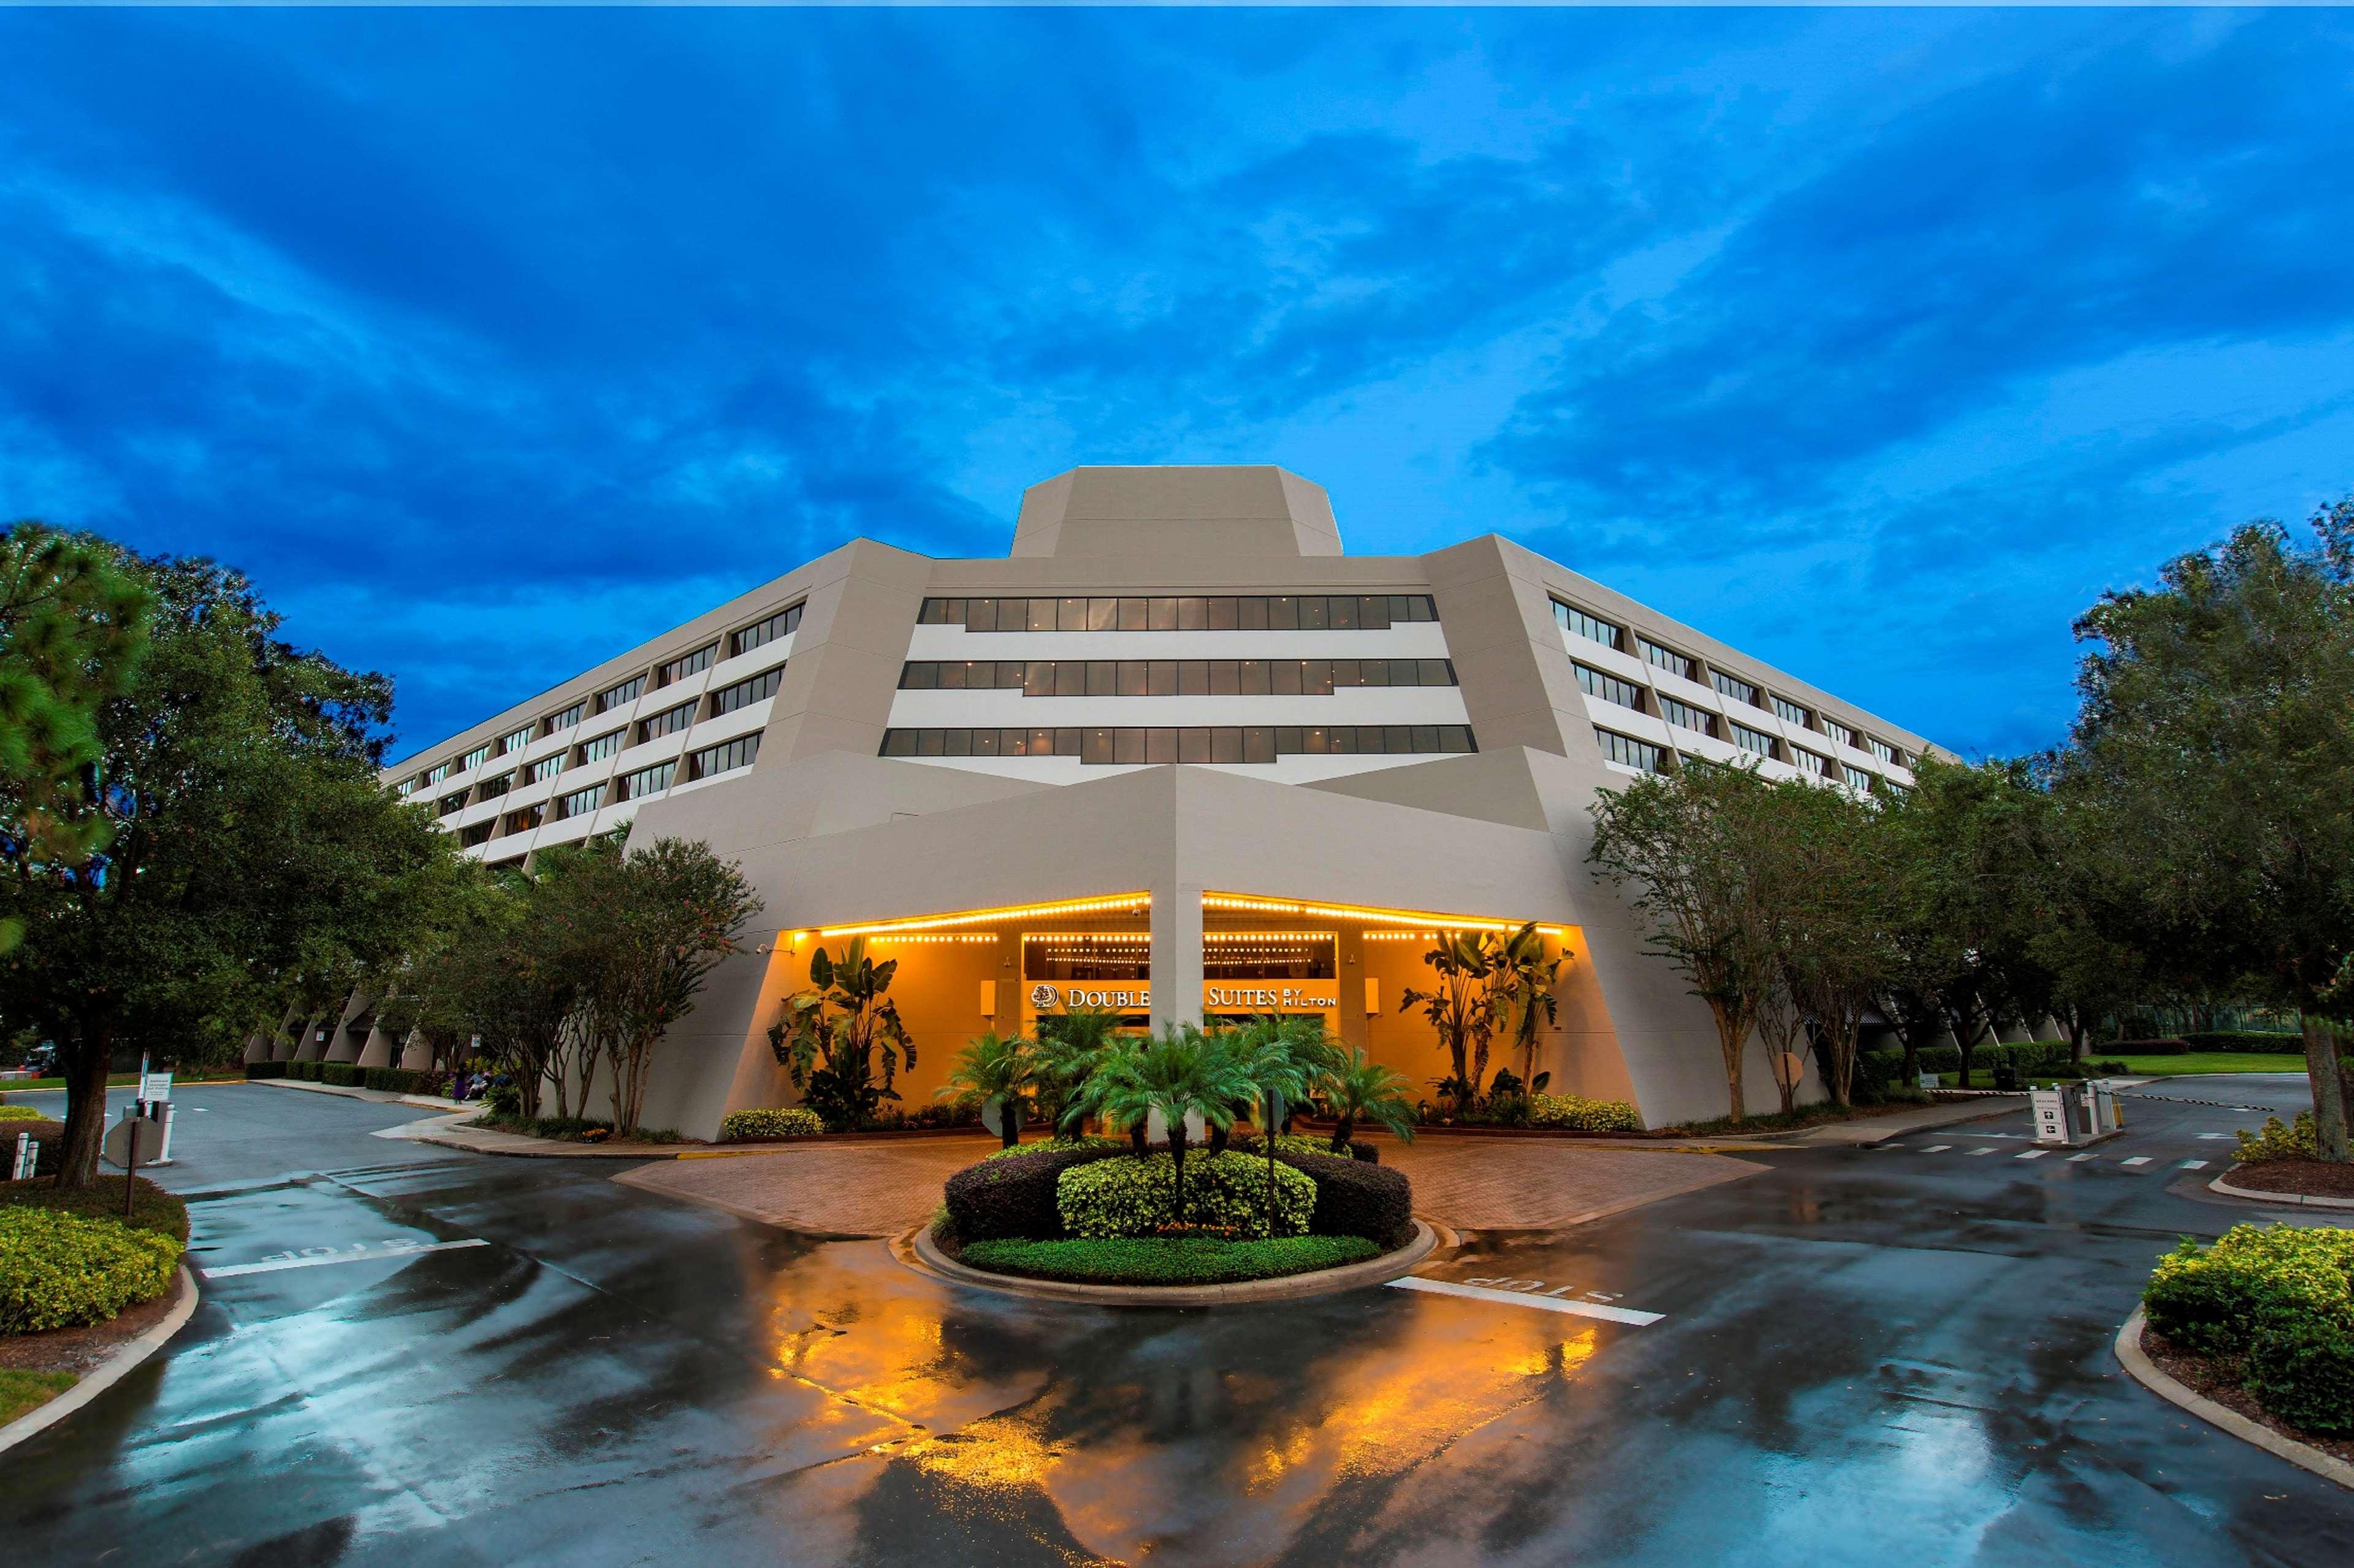 Orlando Hotels With Disney World Shuttle